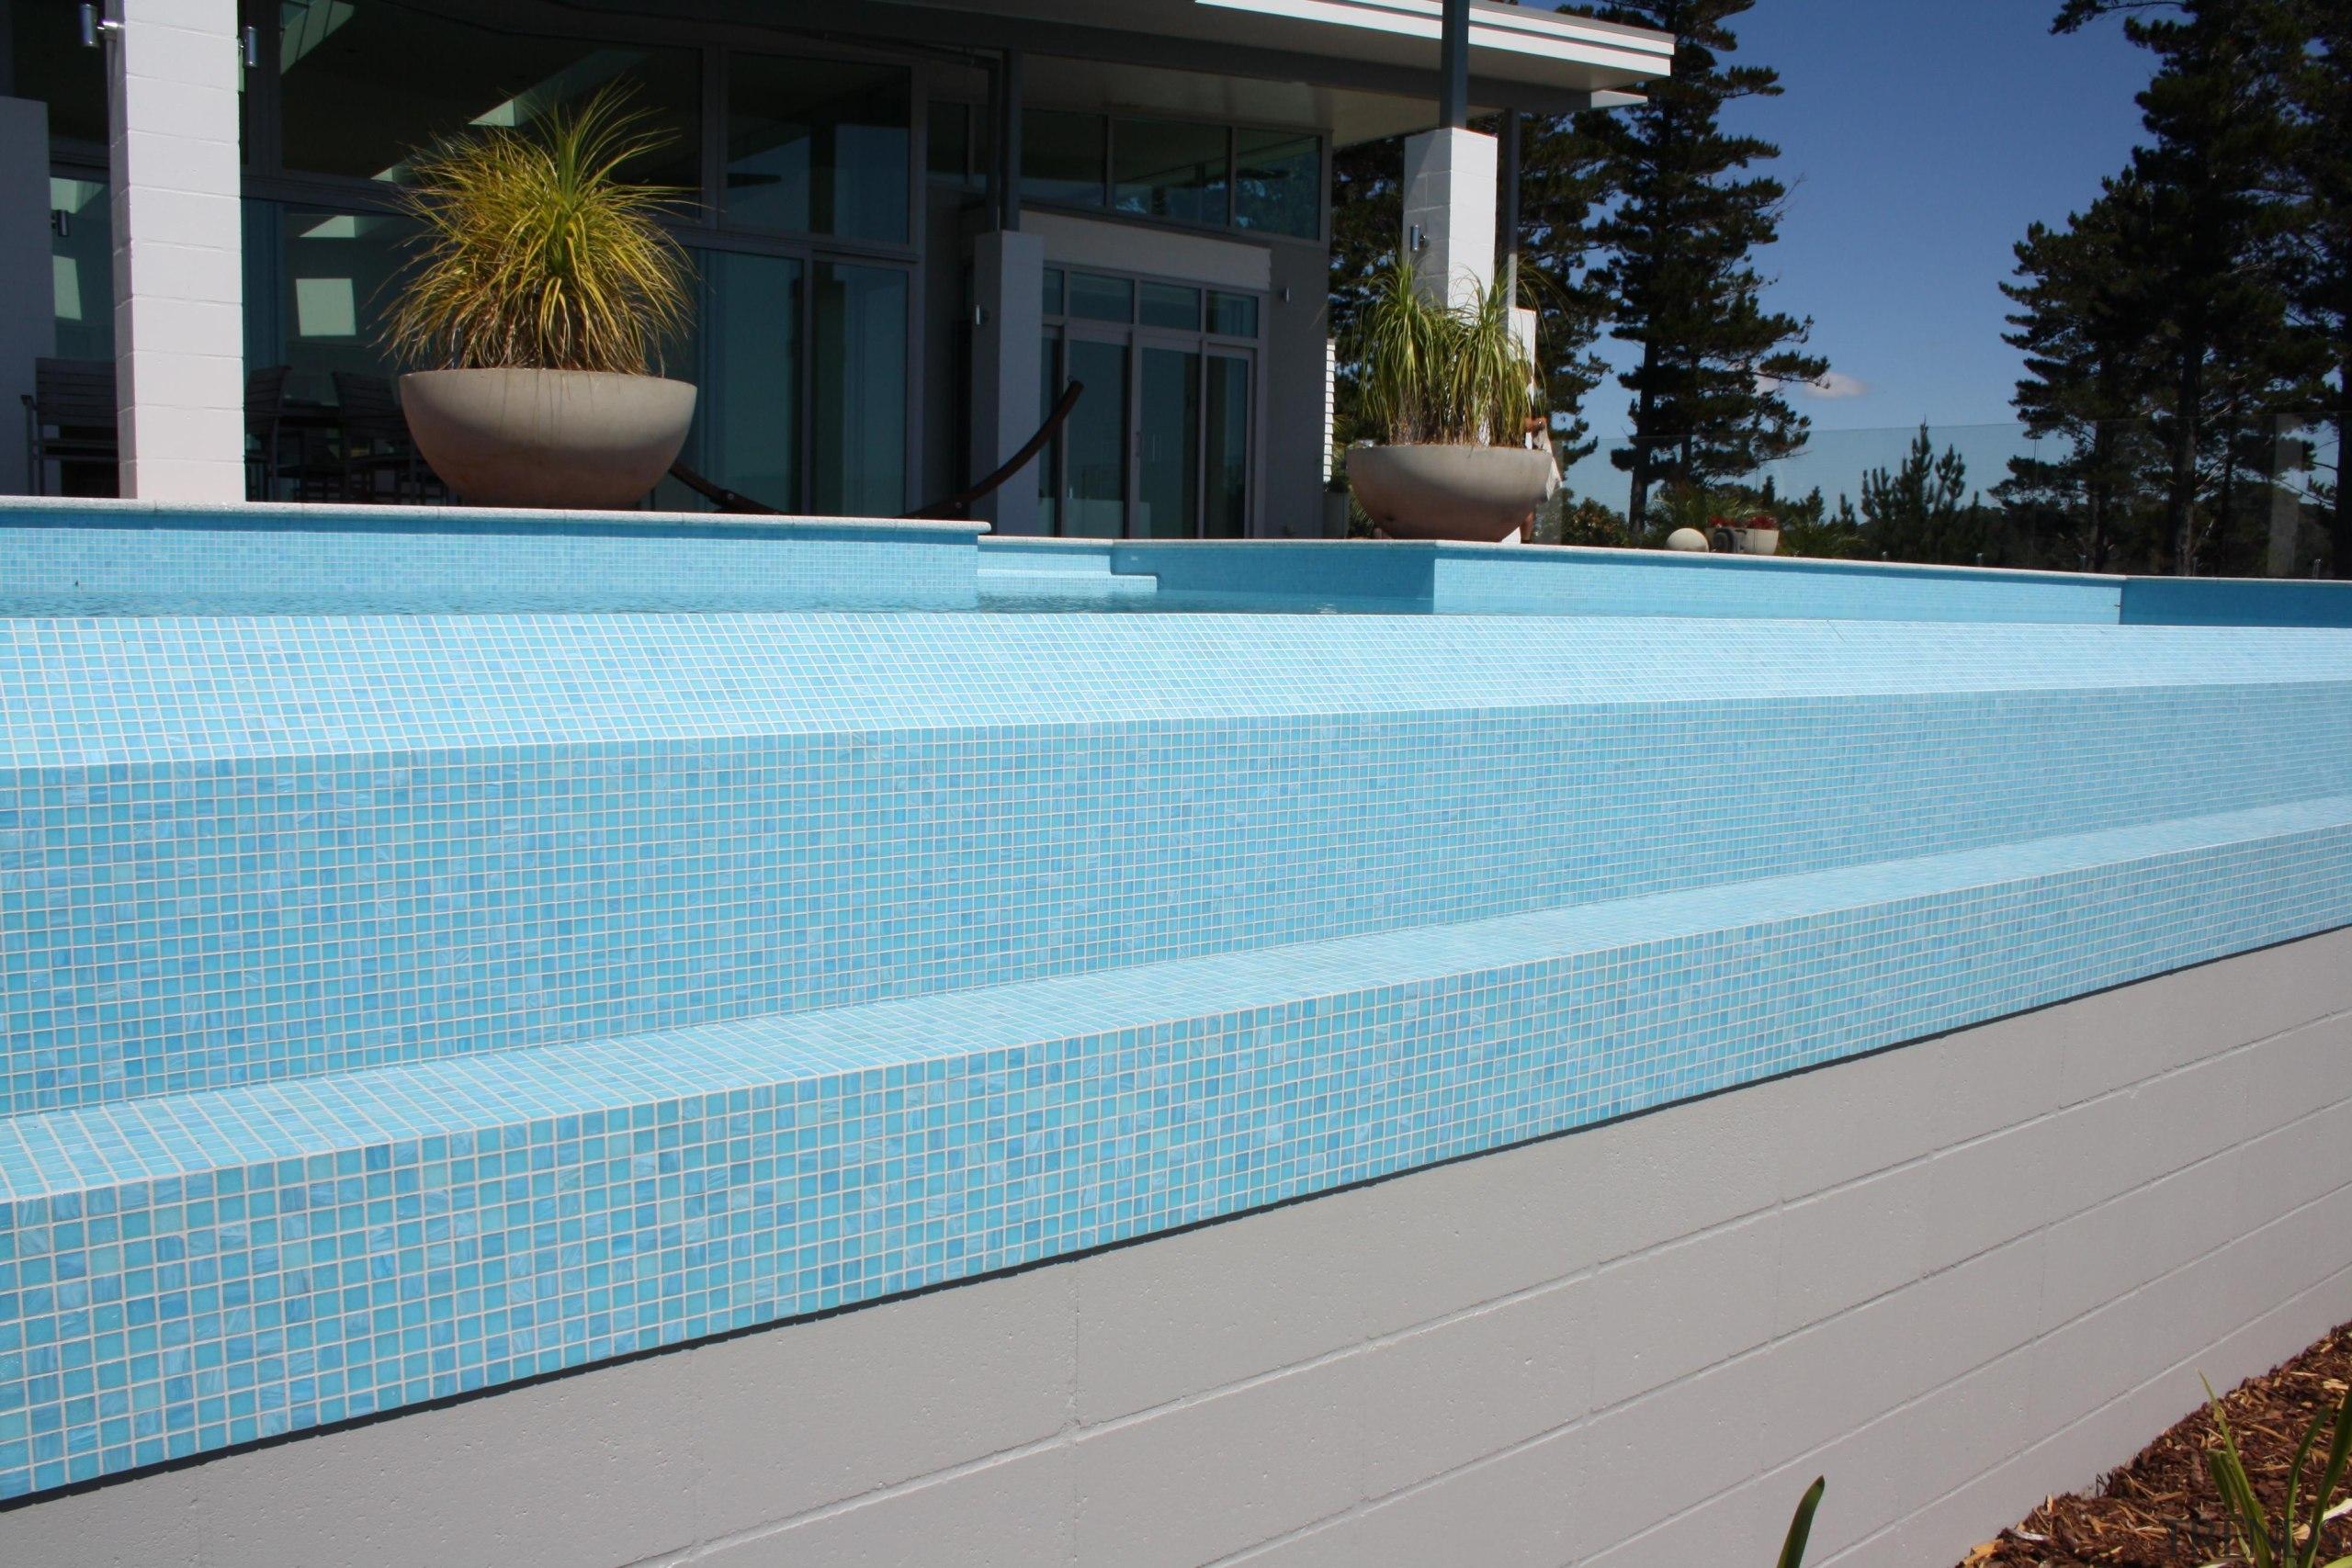 Bisazza Paroa Bay mosaic pool - Bisazza Range backyard, daylighting, estate, house, leisure, property, real estate, roof, siding, swimming pool, wall, window, wood, gray, teal